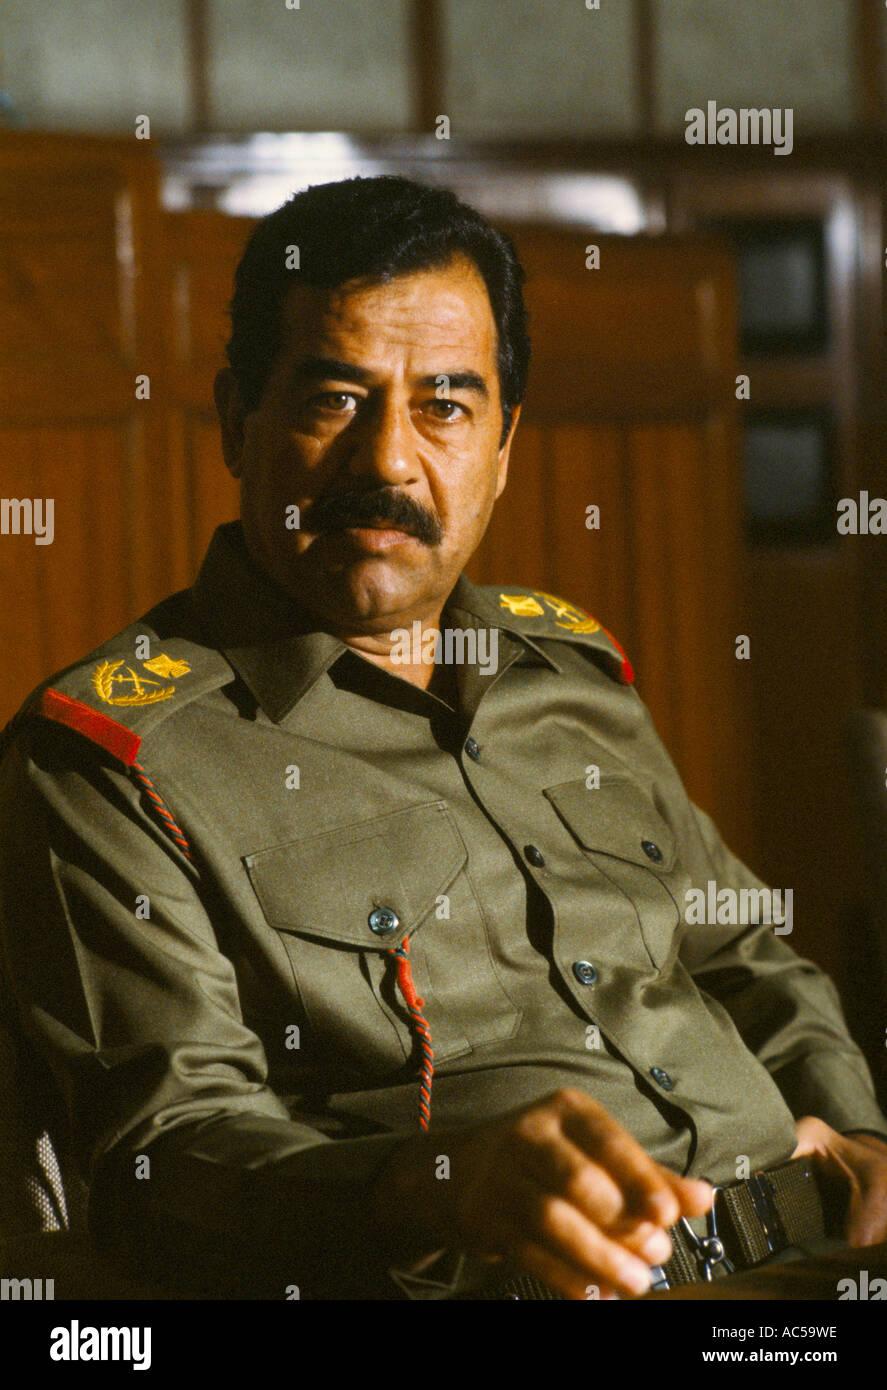 Iraqi Leader Saddam Hussein Images